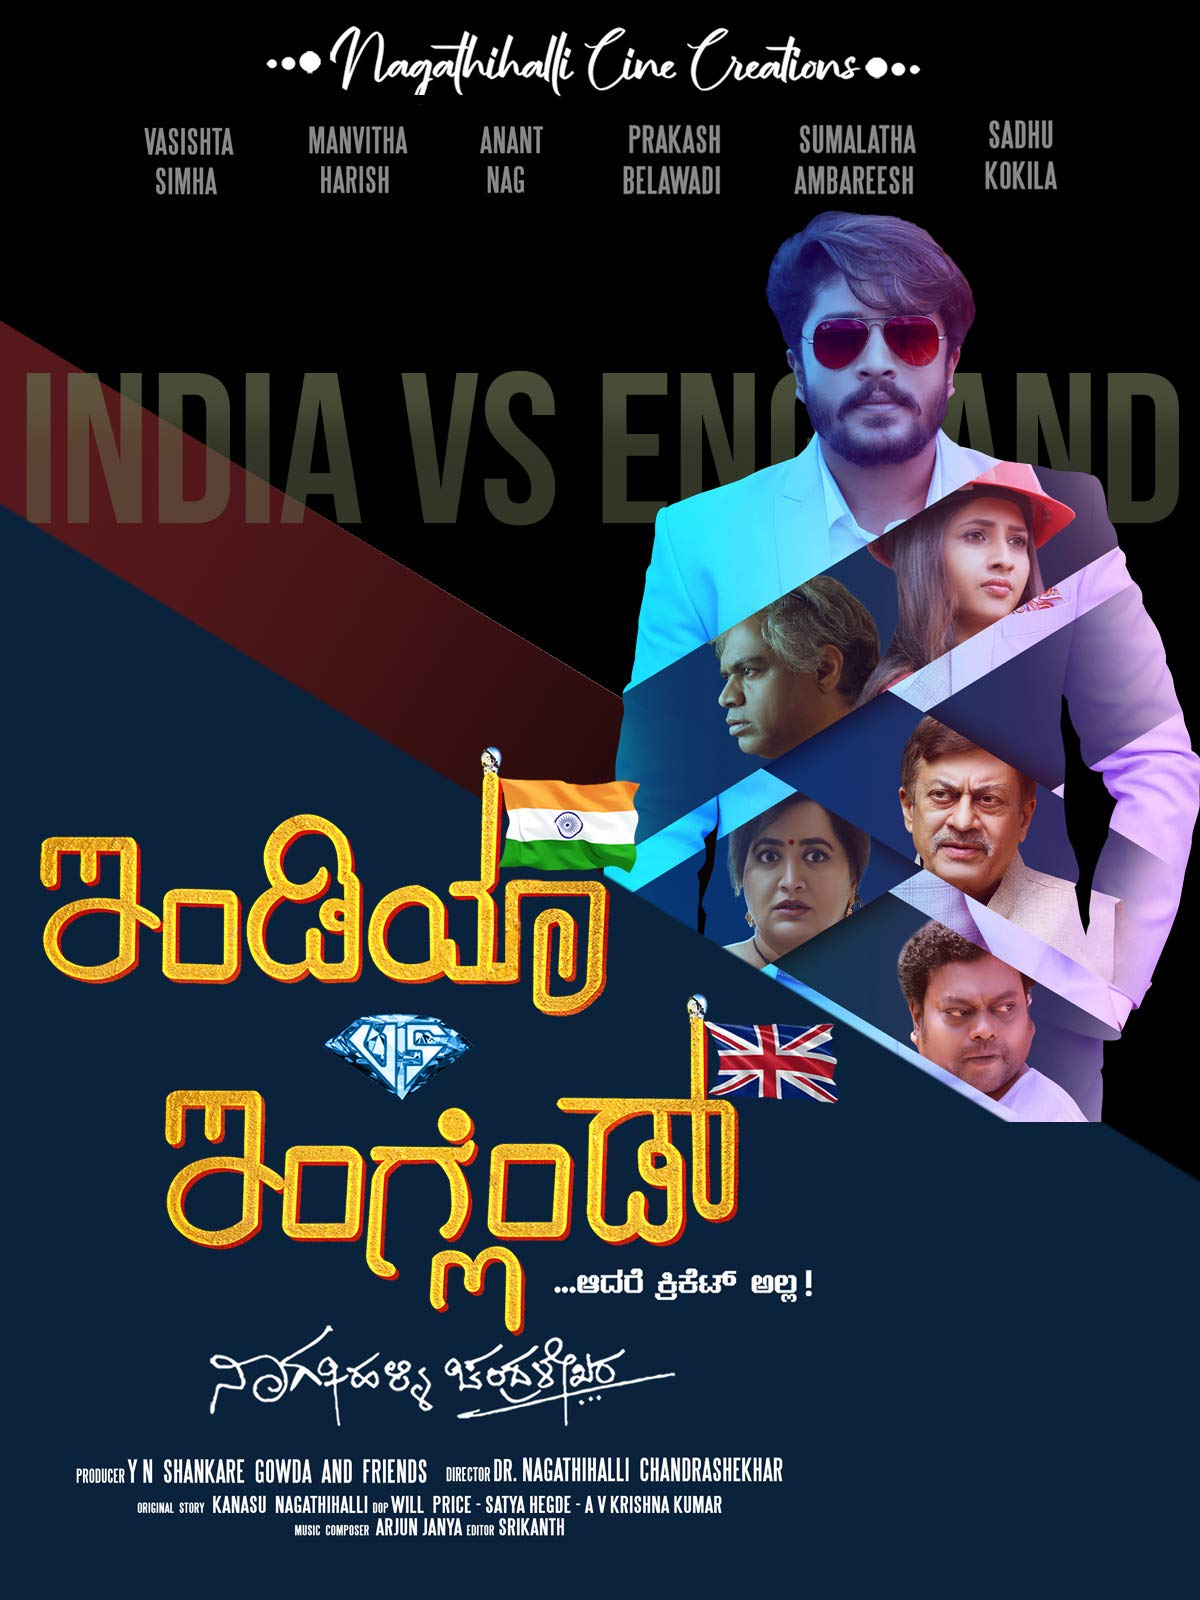 India vs England on Amazon Prime Video UK